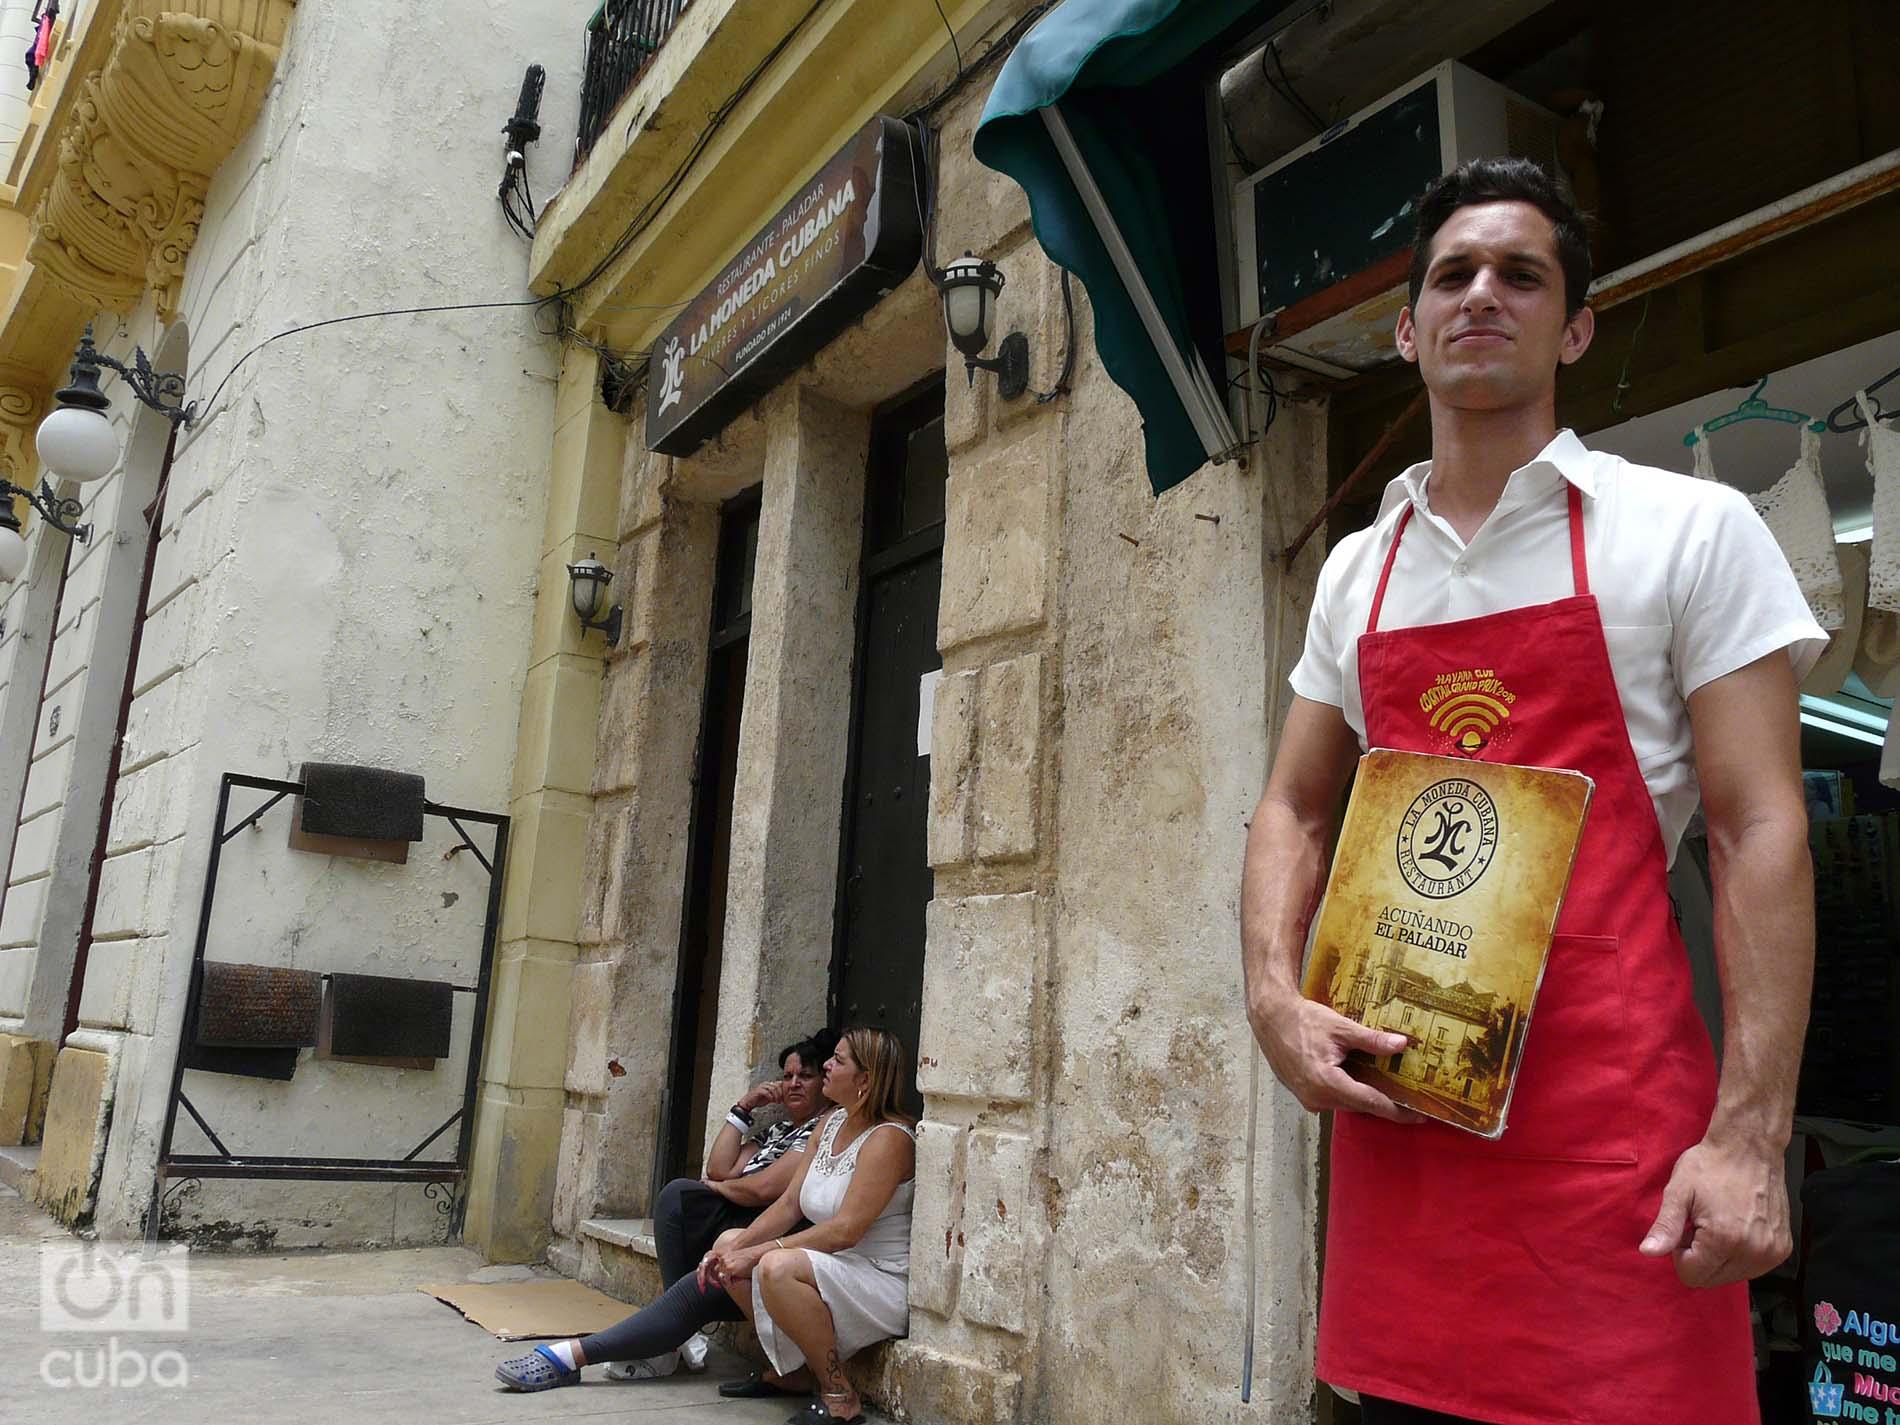 Brian a la entrada del restaurante La moneda cubana. Foto: Ángel Marqués Dolz.